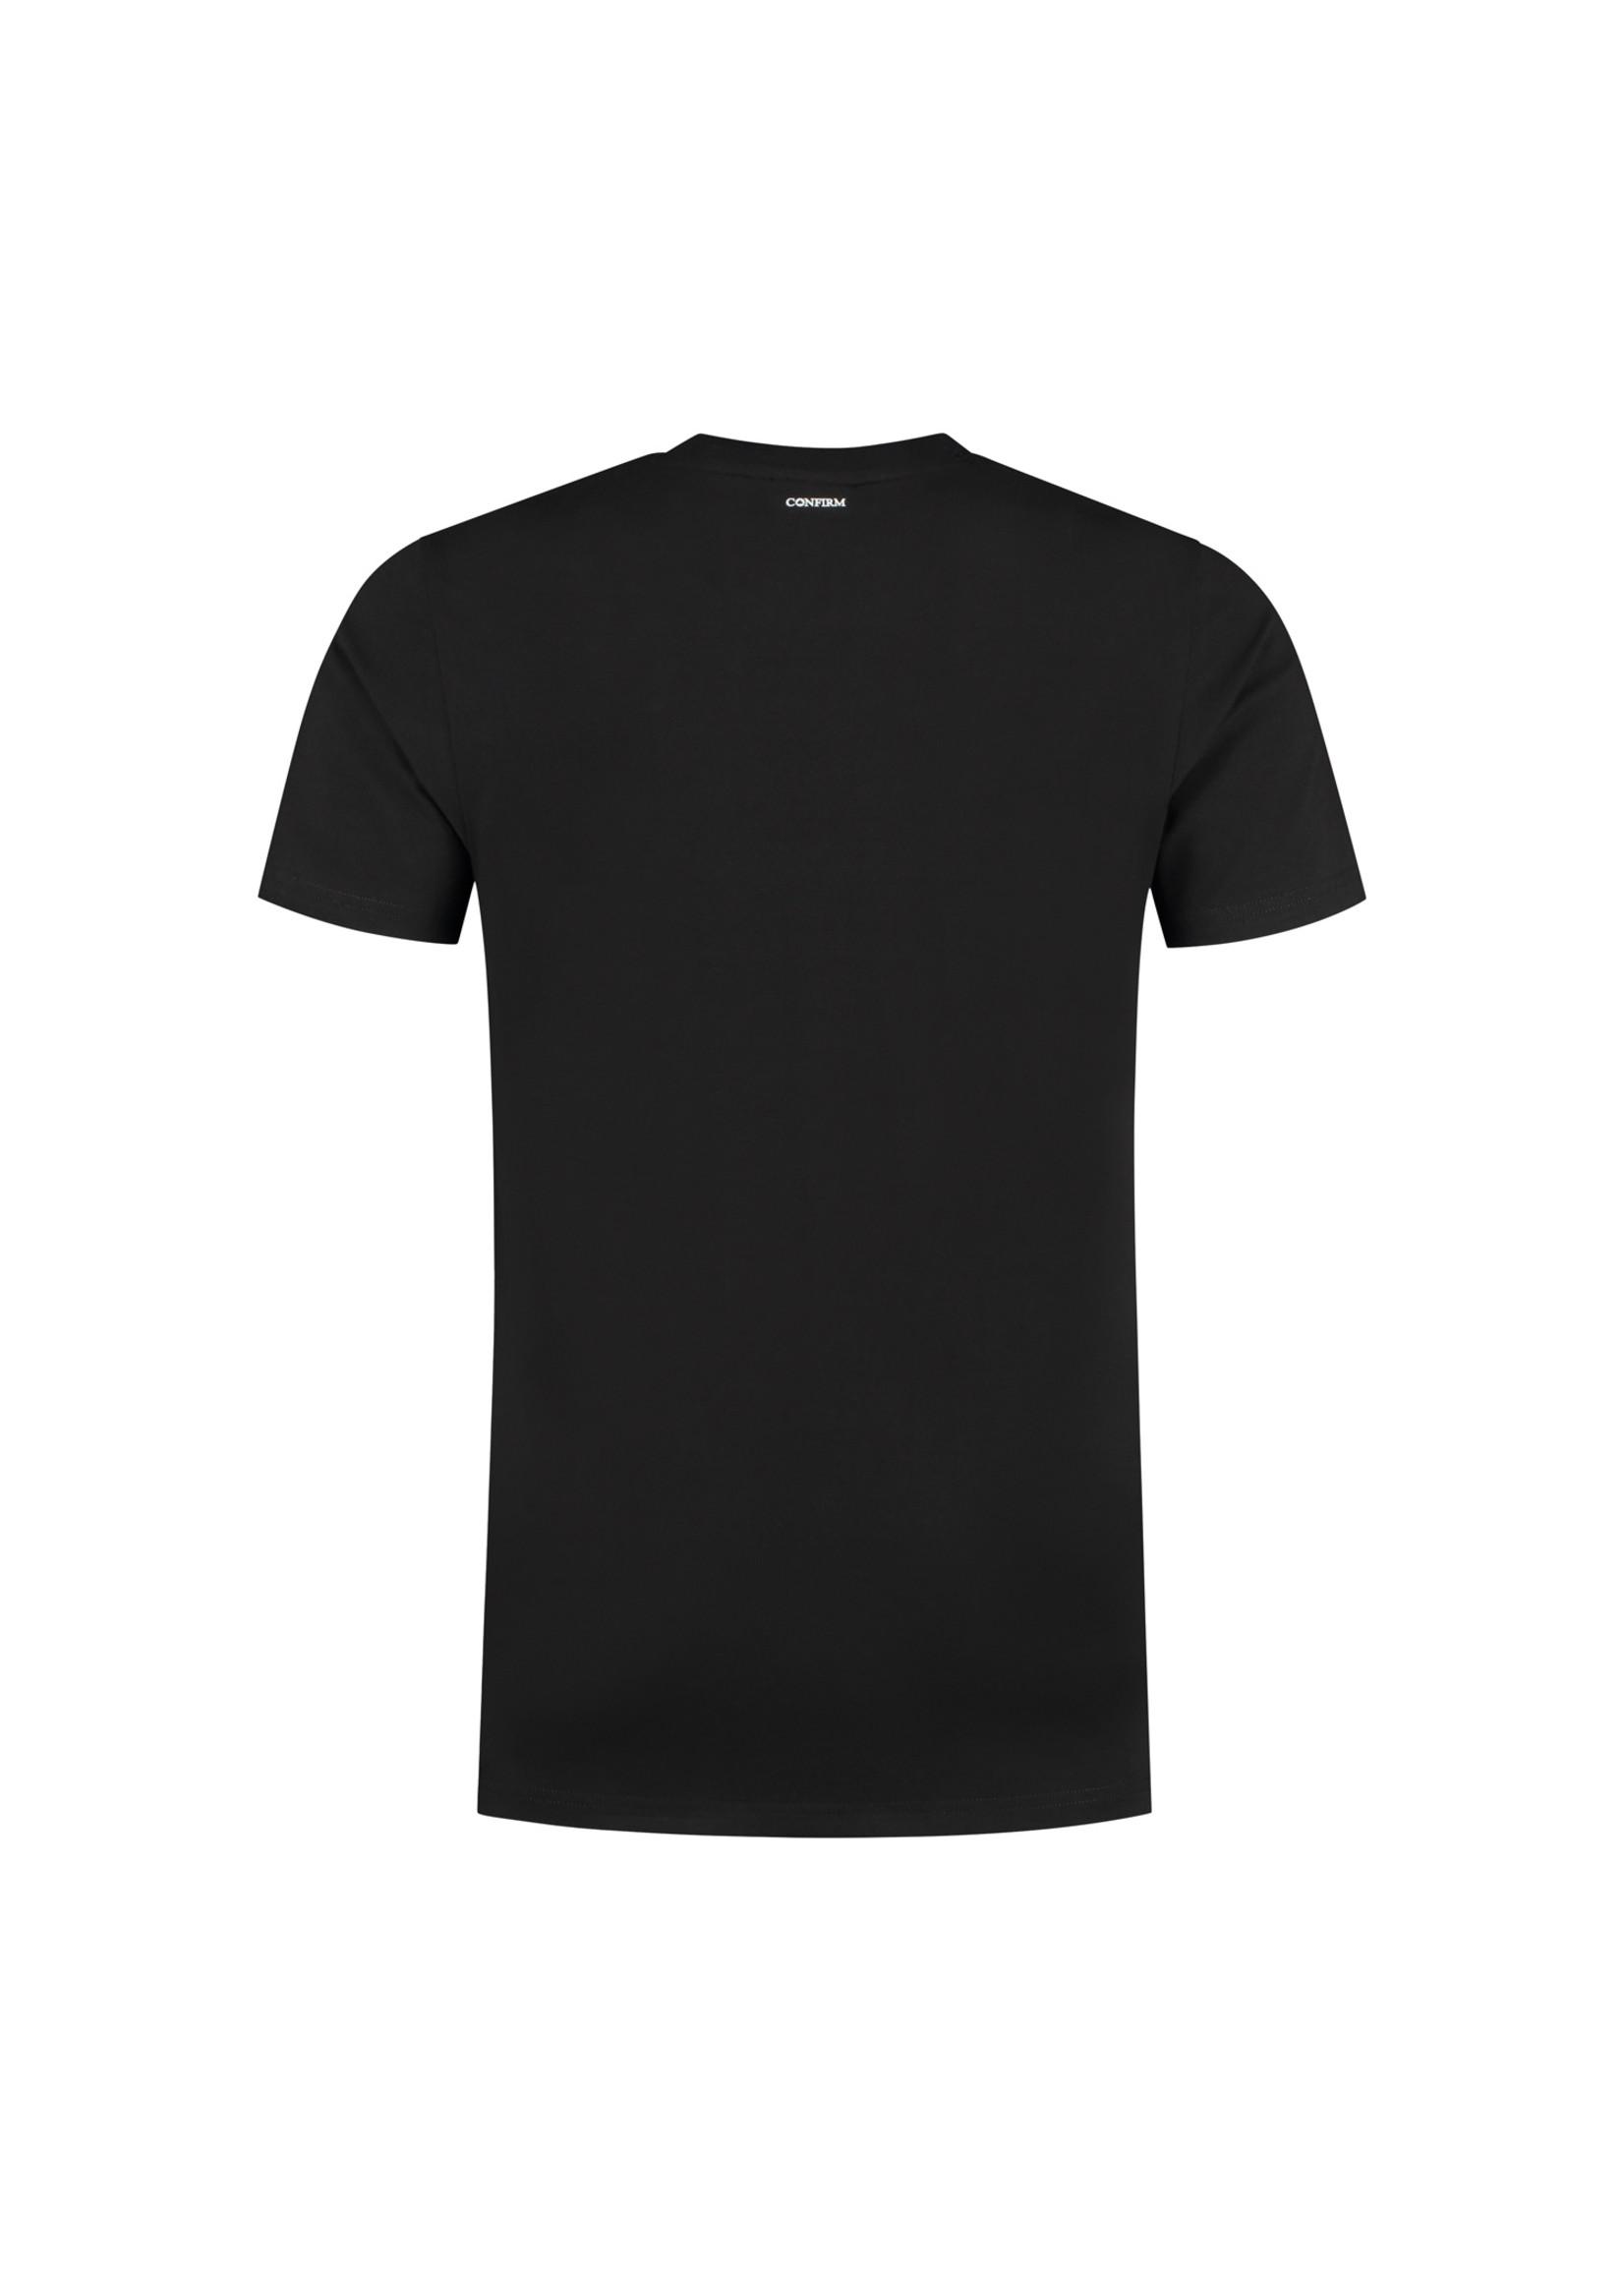 Confirm basic T-shirt patch - black